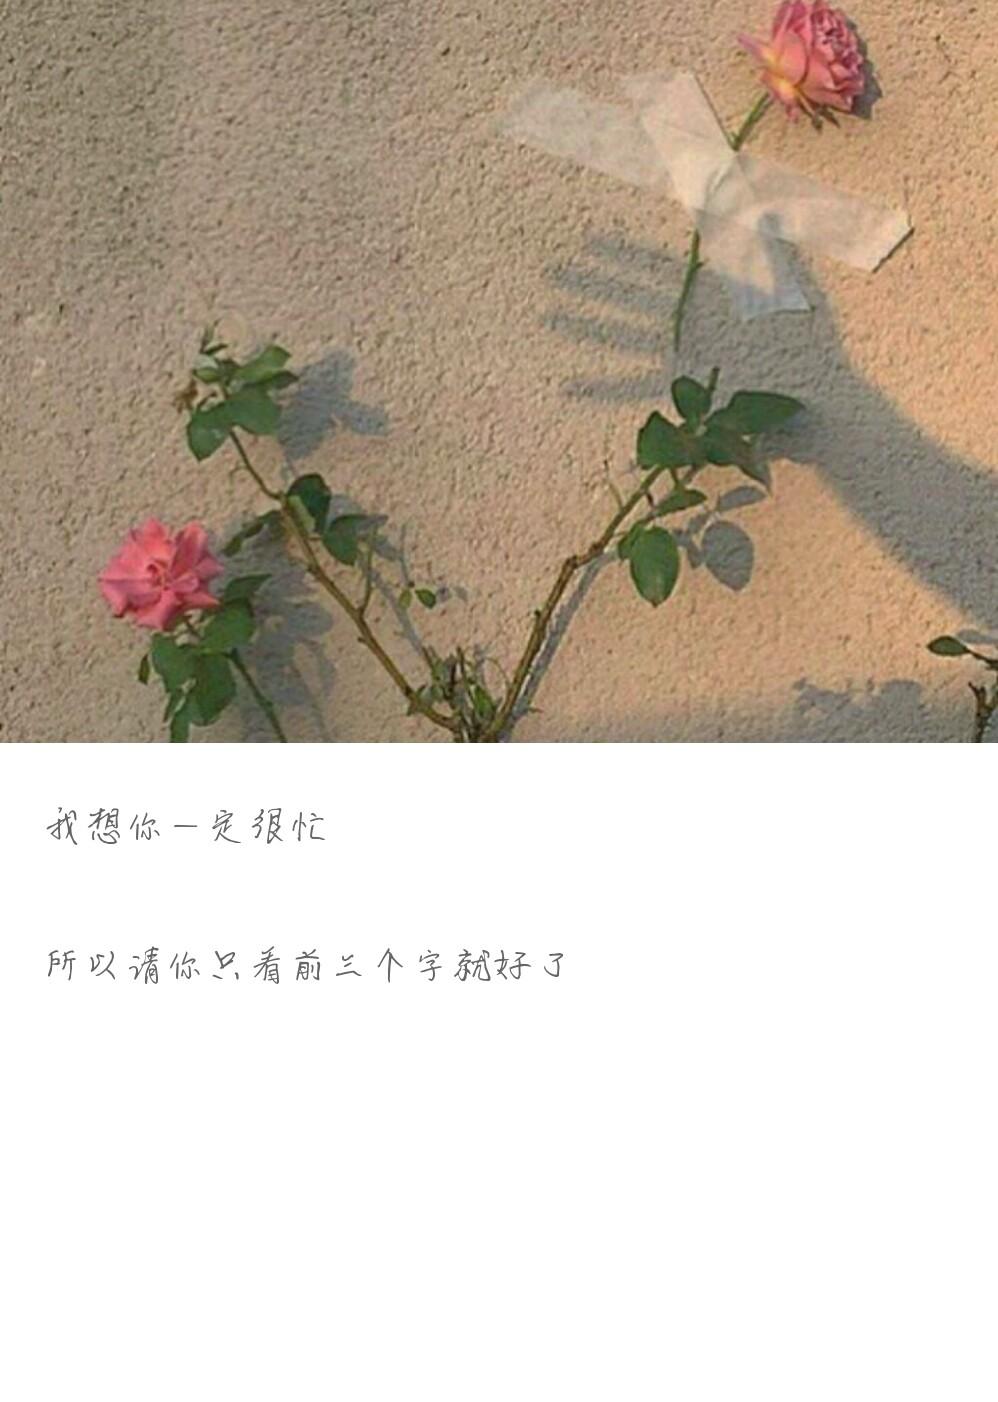 http://www.58100.com/pid/596537.html